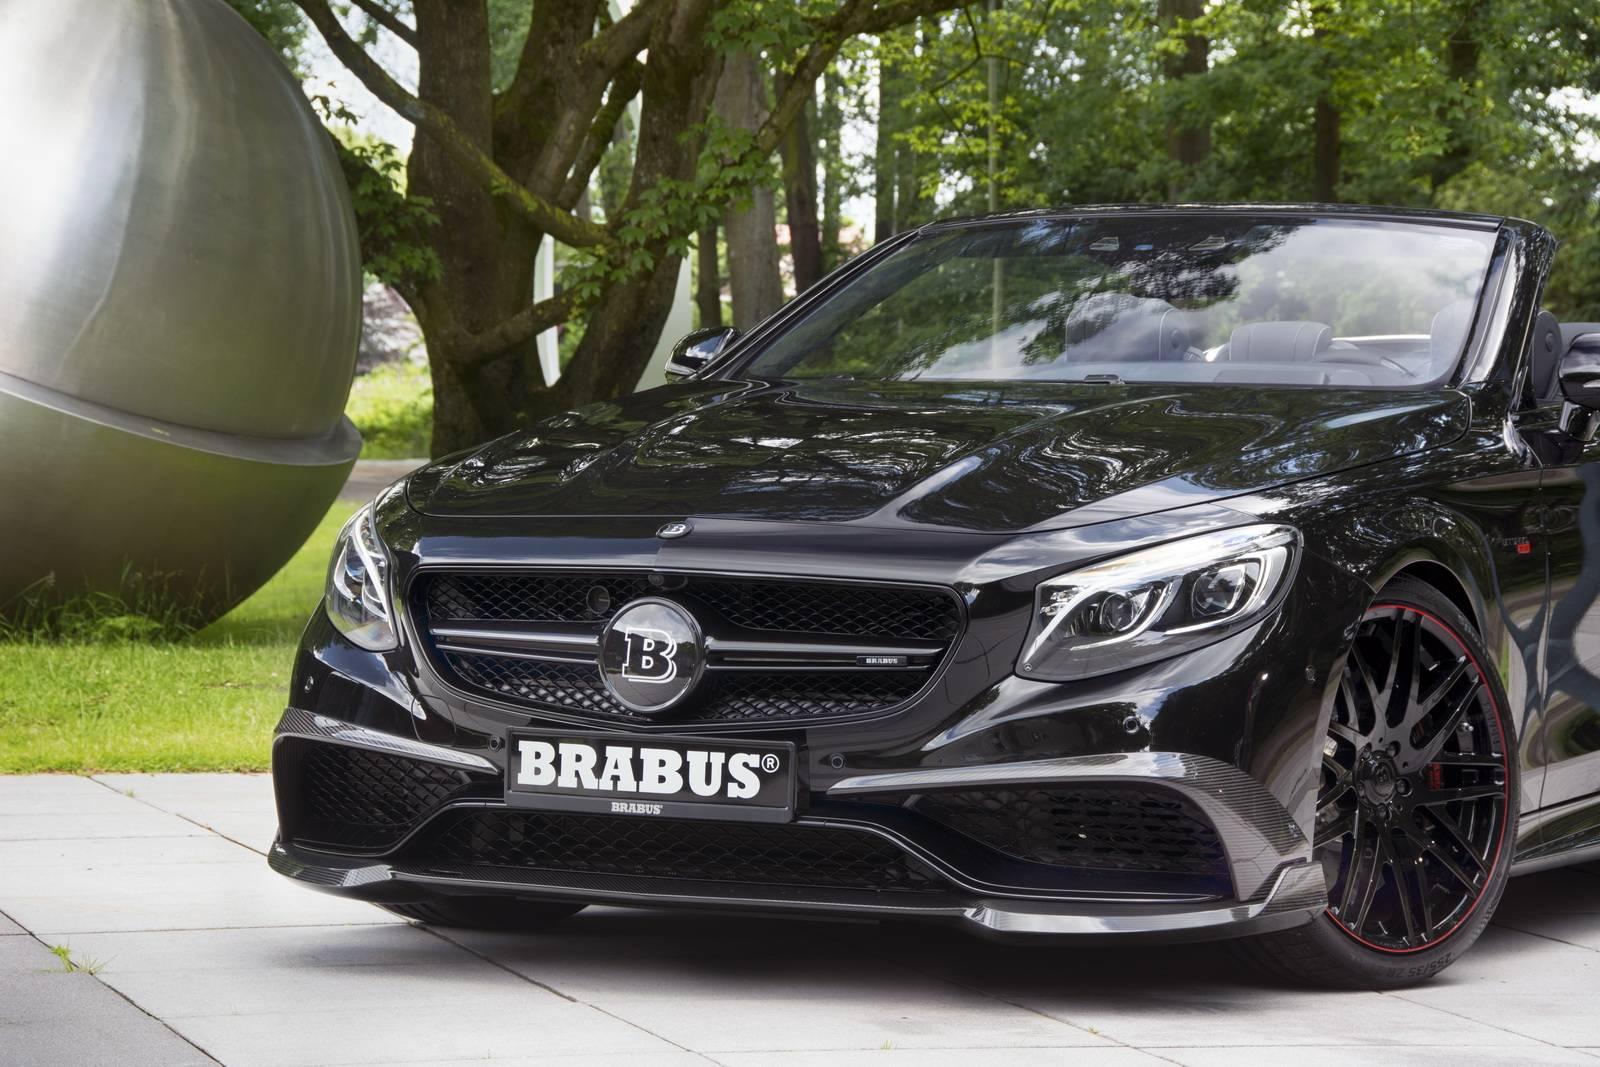 official 850hp brabus mercedes amg s63 cabriolet gtspirit. Black Bedroom Furniture Sets. Home Design Ideas